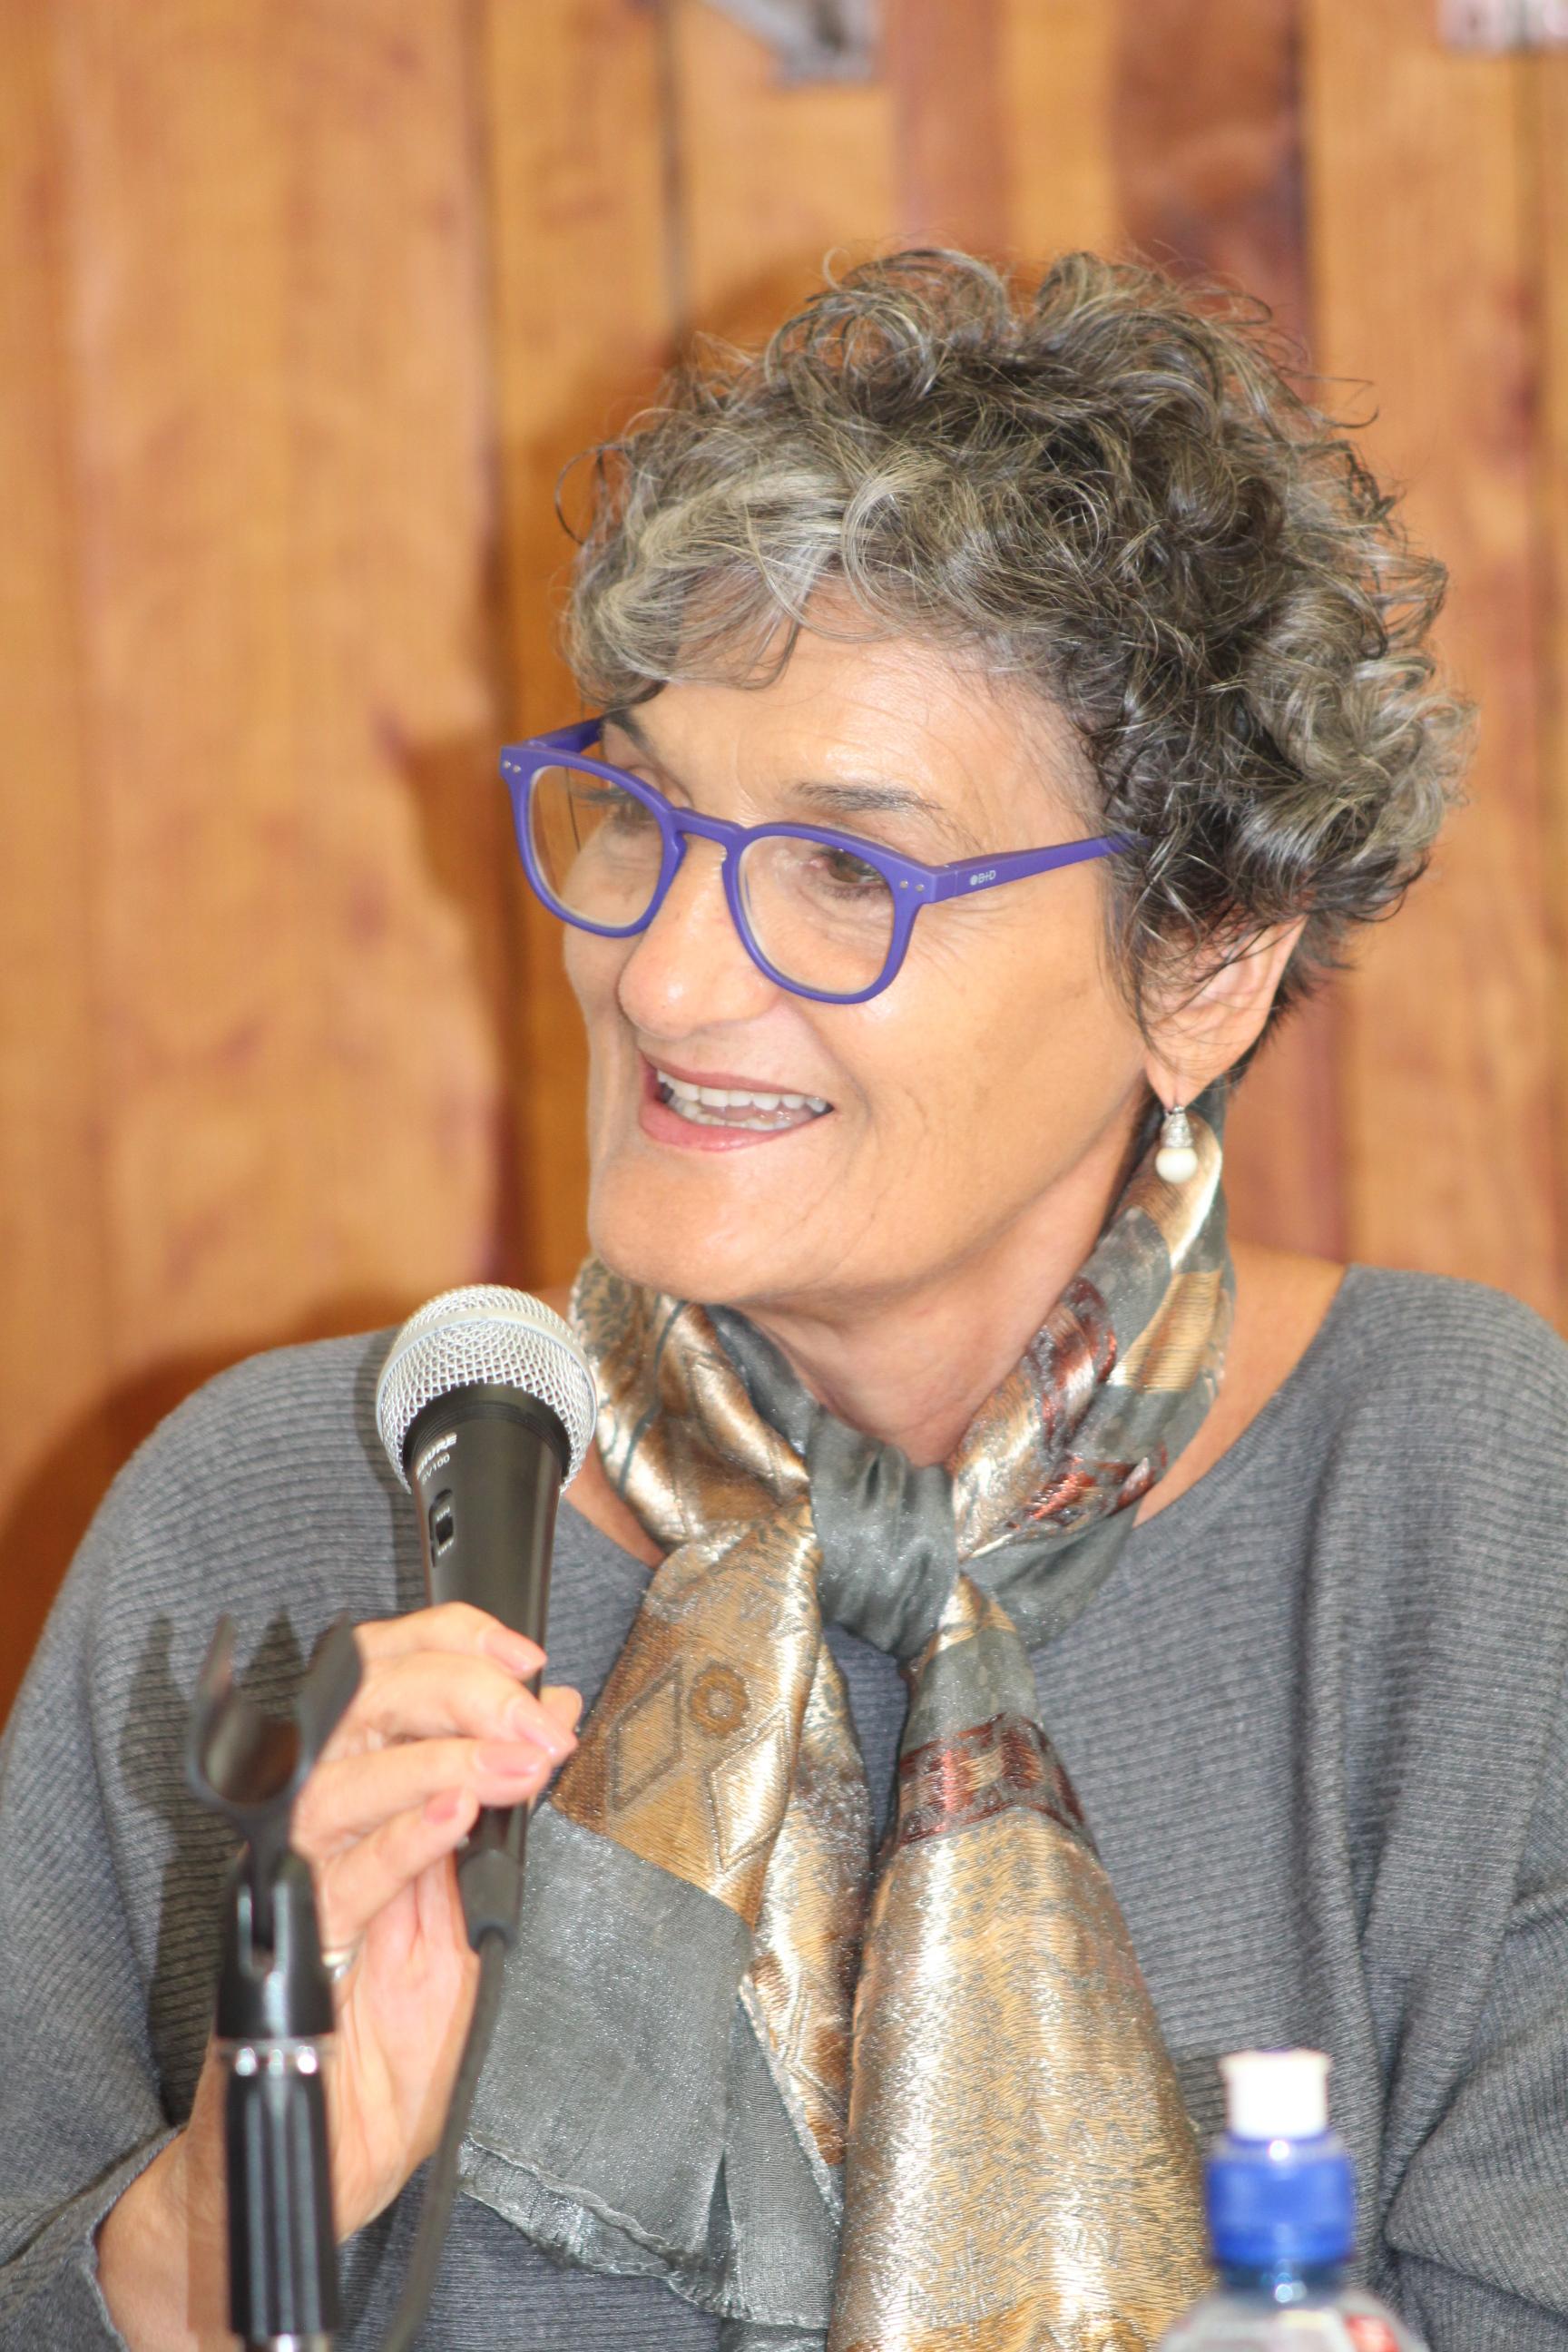 Cristina Girardo Pierdominici